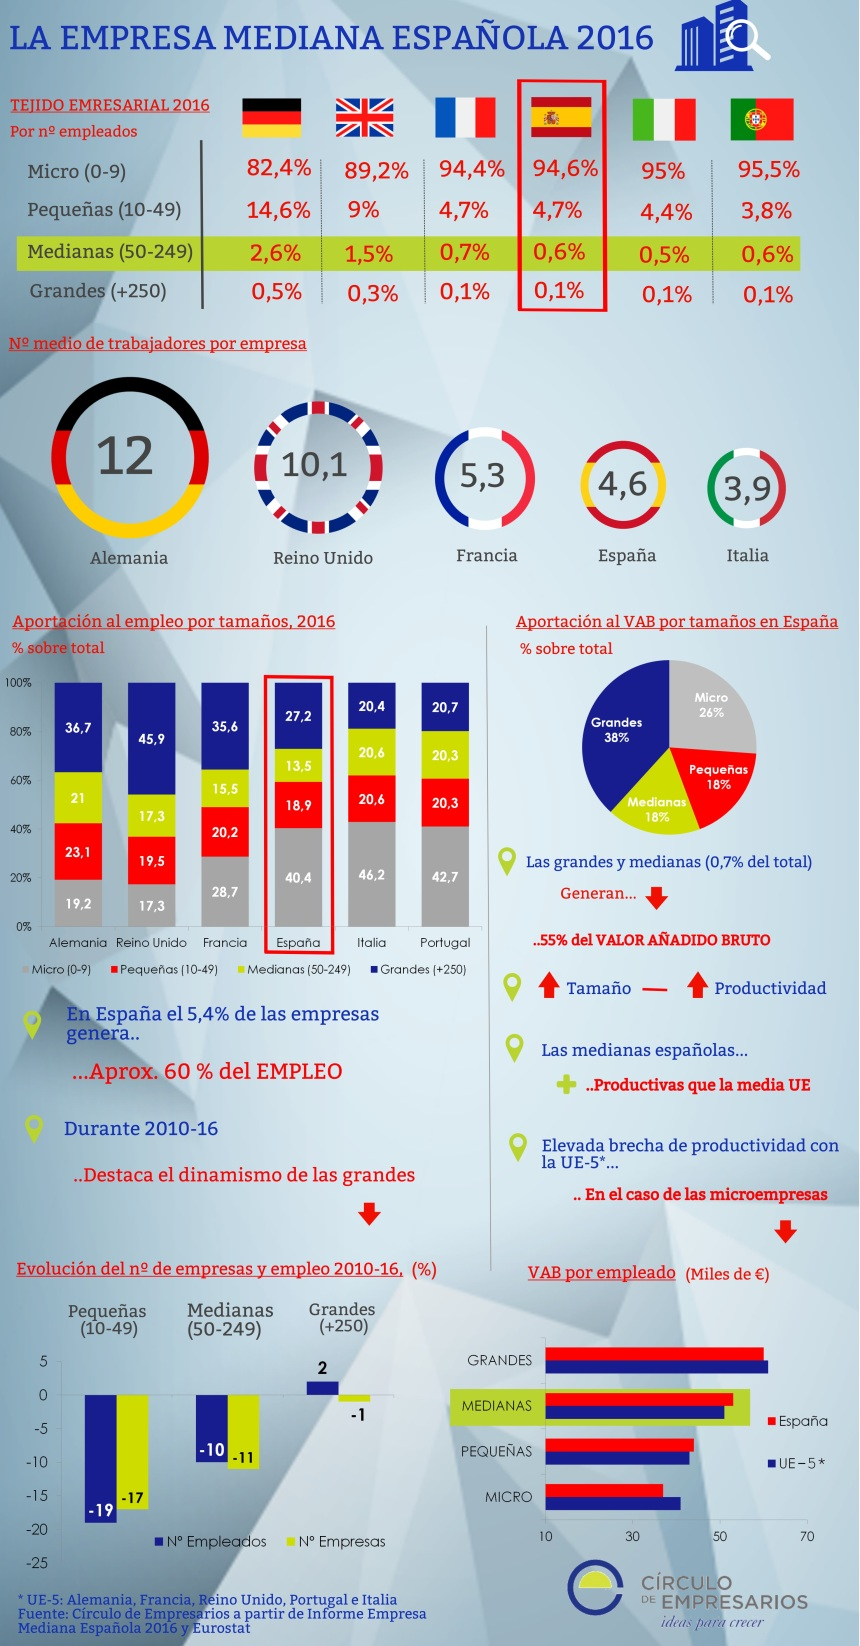 La empresa mediana española